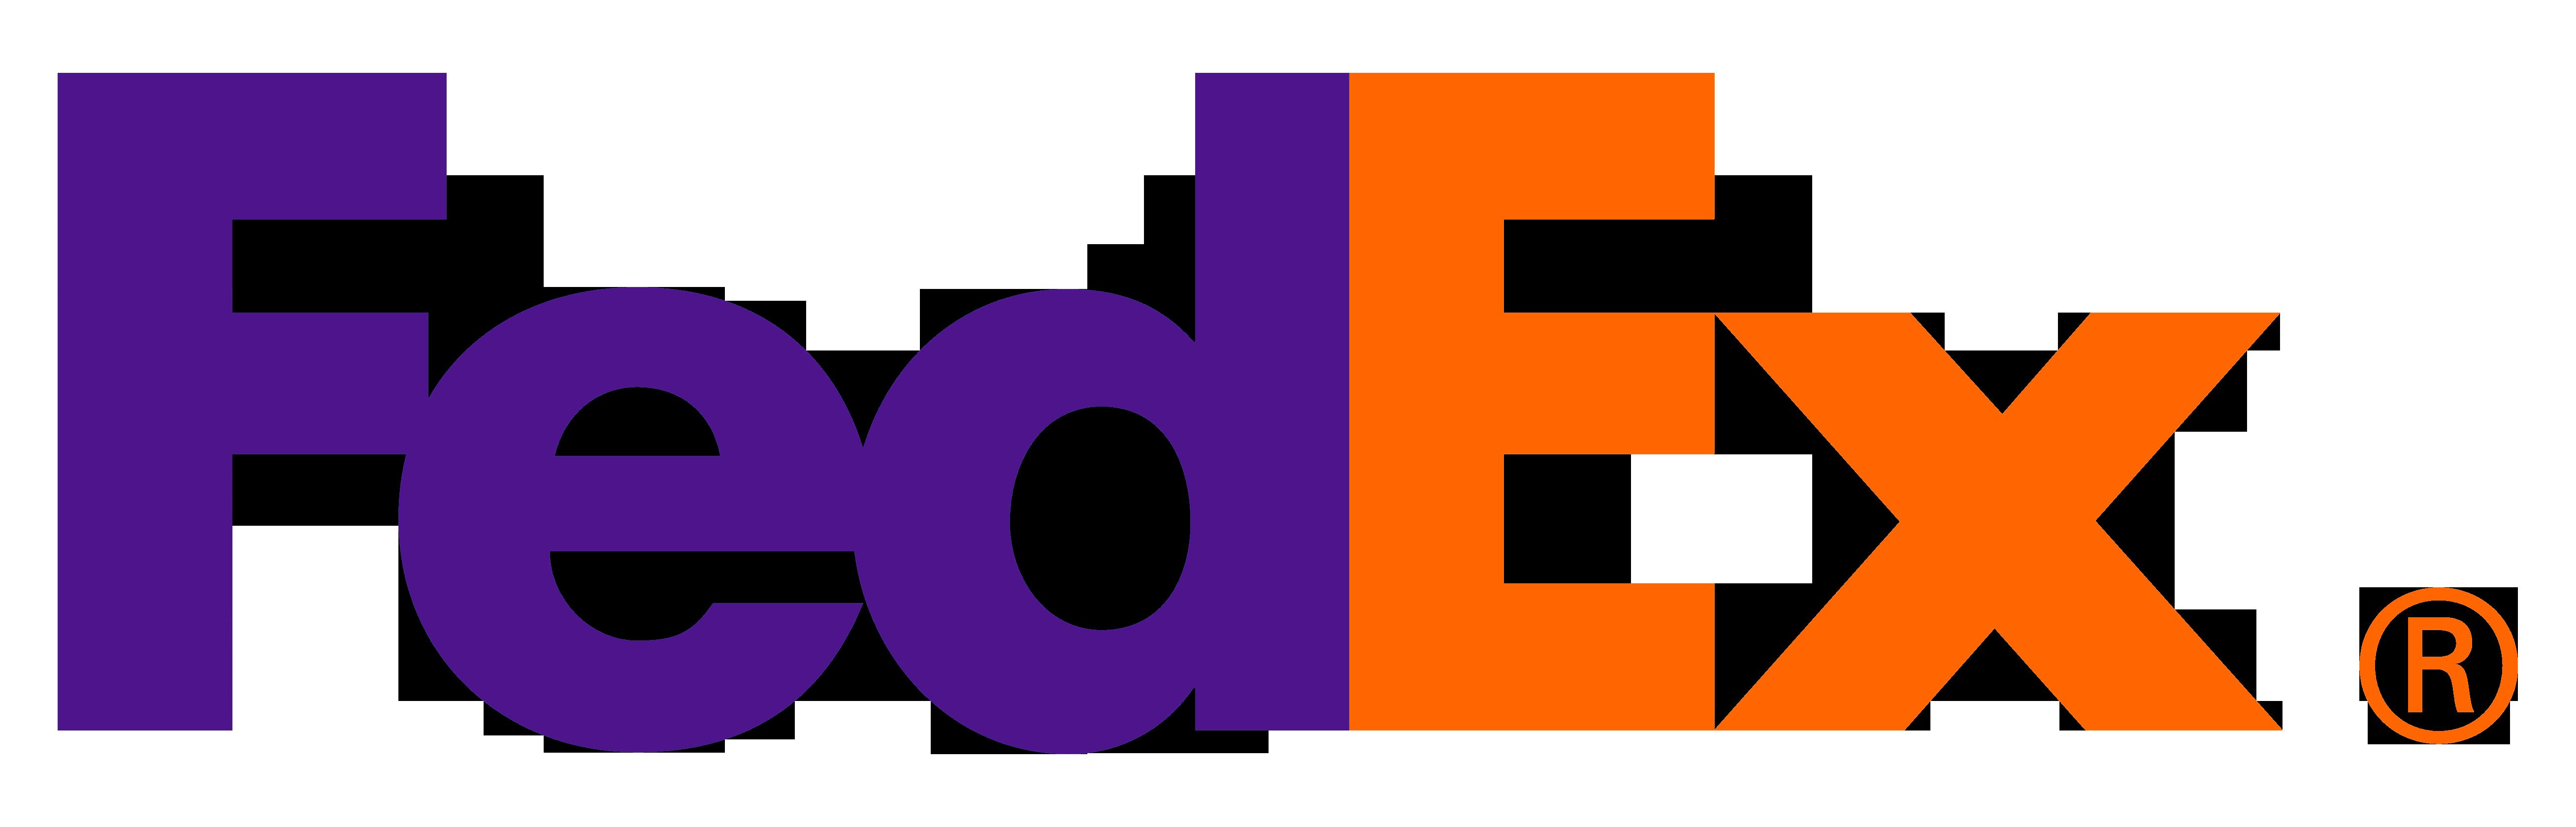 FedEx-Logo-PNG-Transparent